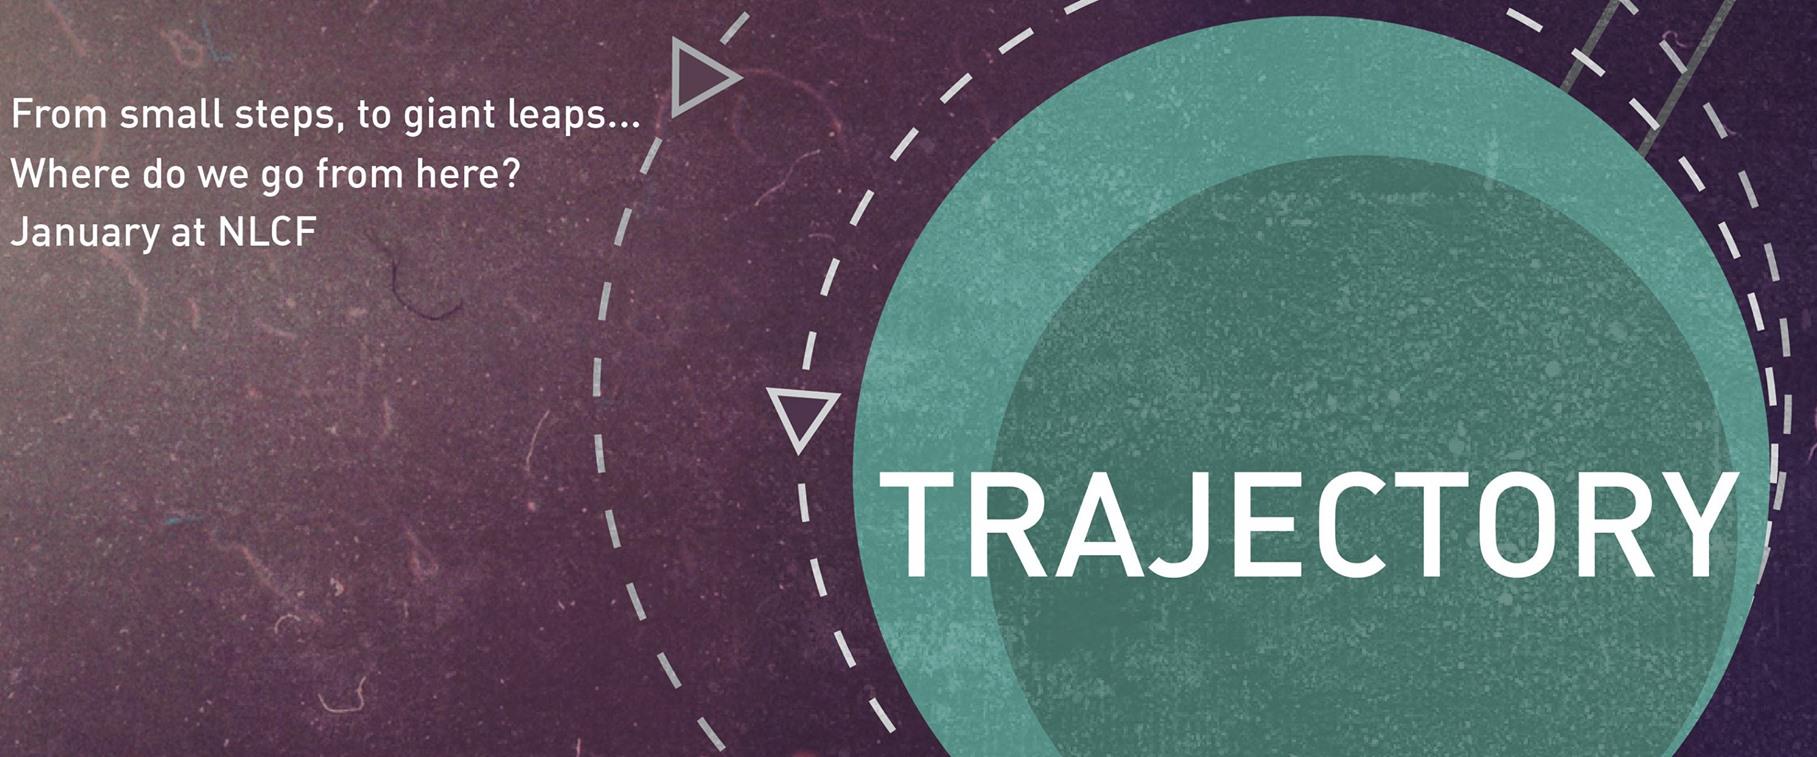 trajectory_slider